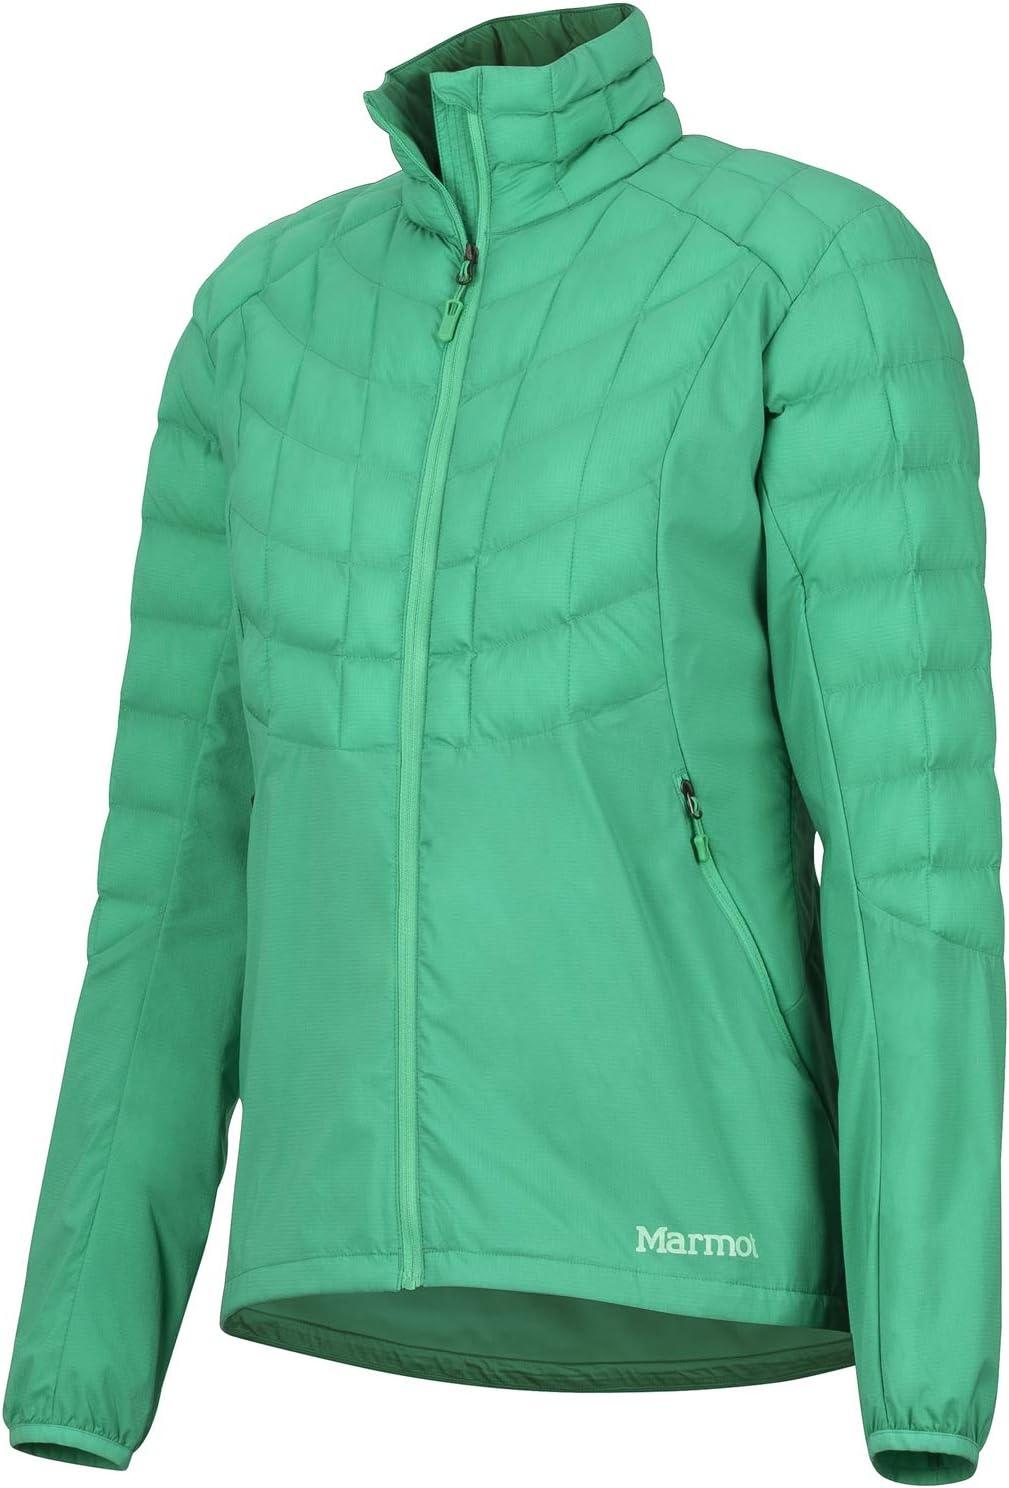 Coupe-Vent Marmot Wms Featherless Hybrid Jacket Softshell Isolante Veste de randonn/ée Anorak Femme